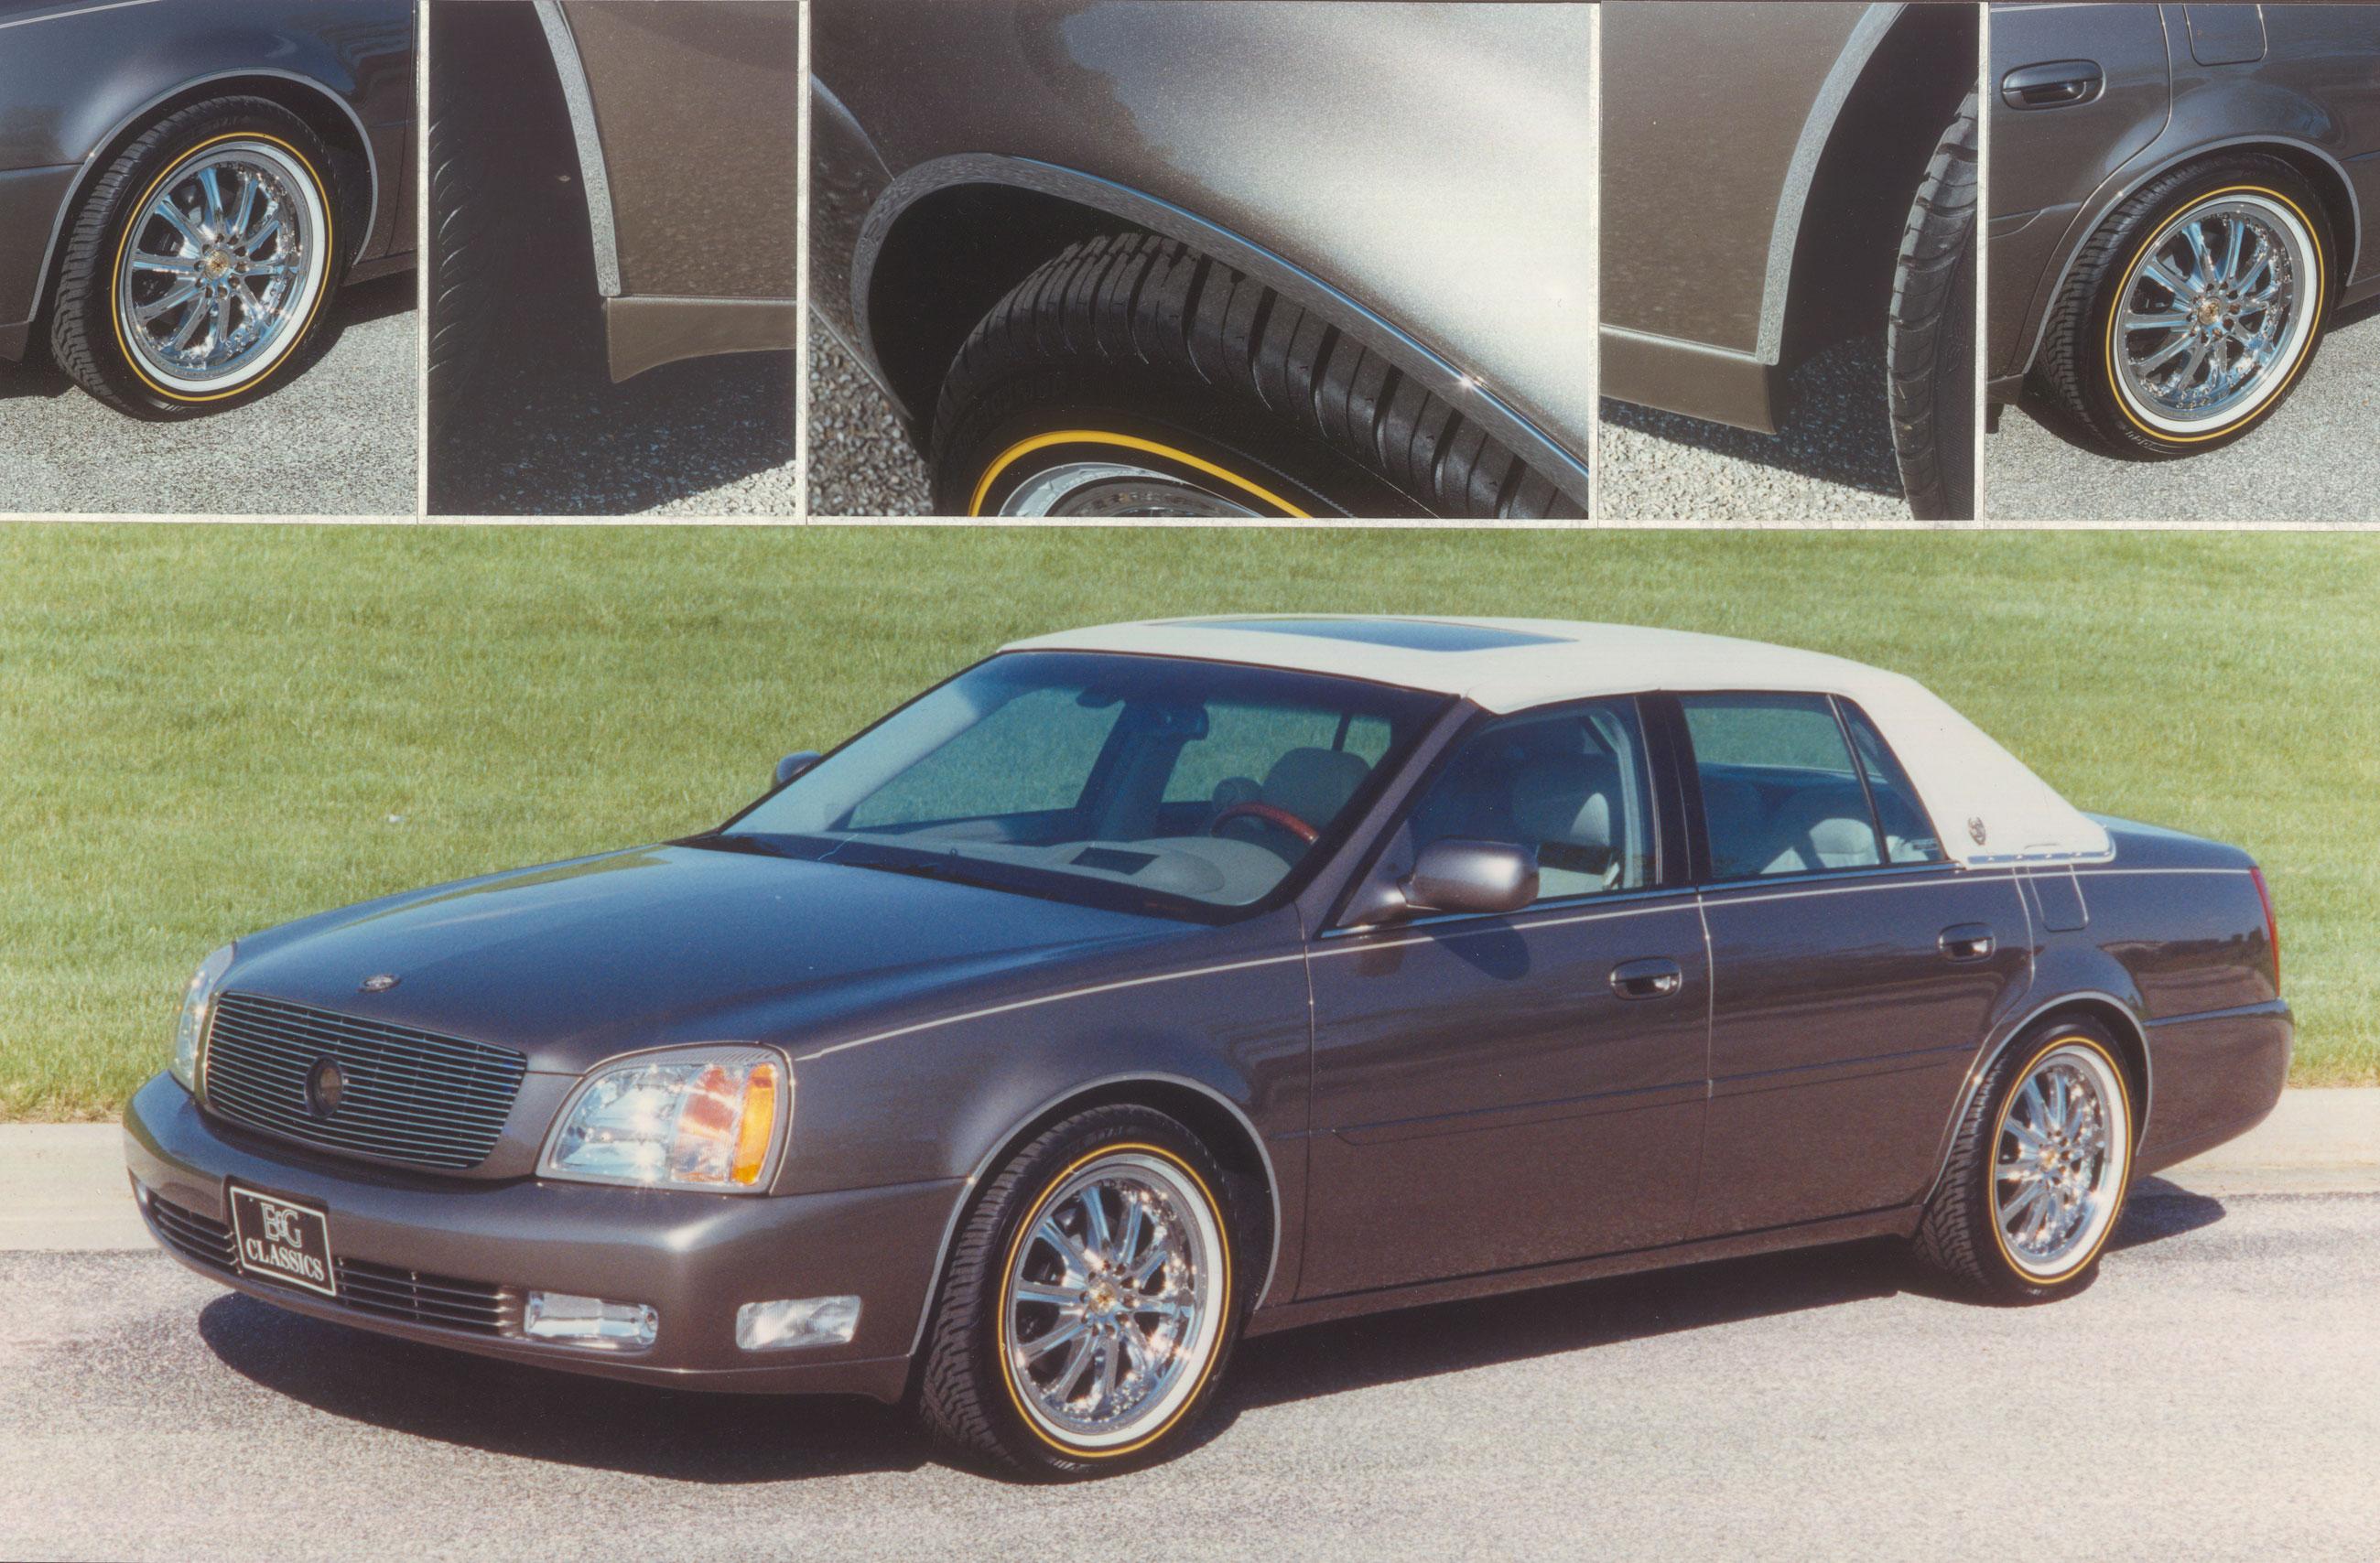 Cadillac DTS 2005 - 2011 Sedan #2